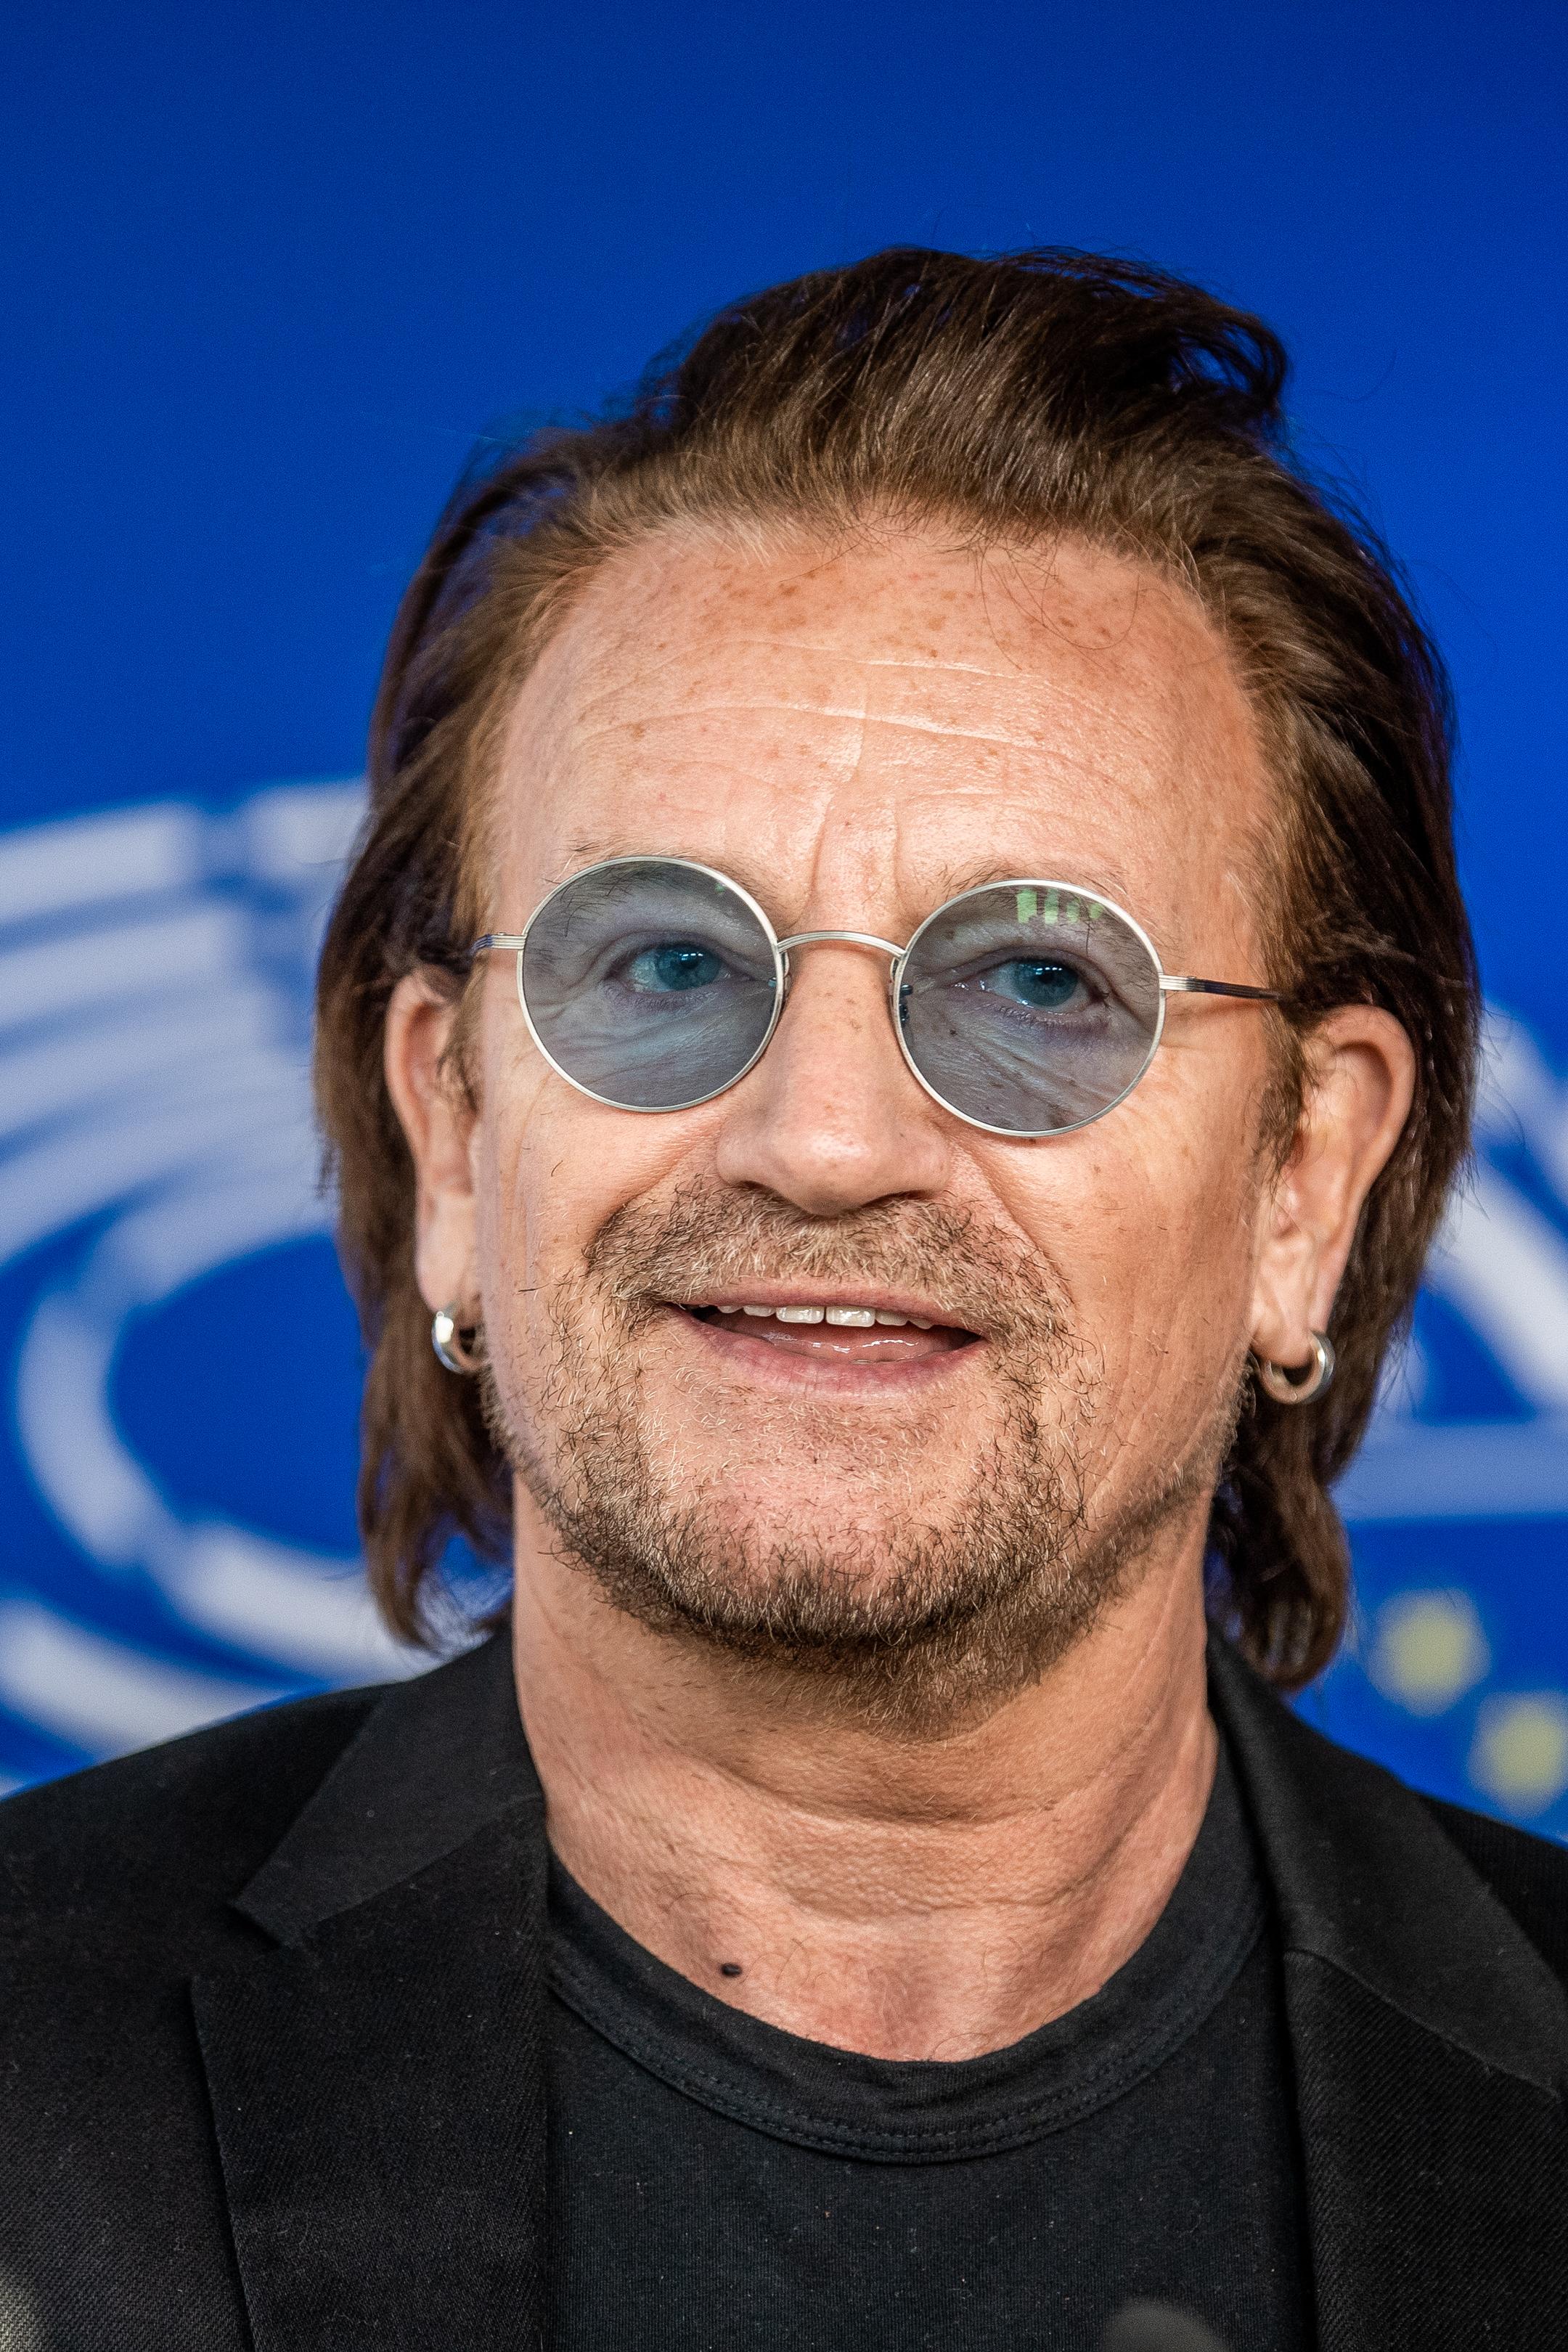 Brussels , 10/10/2018 Bono Of The Rock Band U2 Visits The European Parliament . Pix : Bono Credit : Mathieu Golinvaux / Isopix